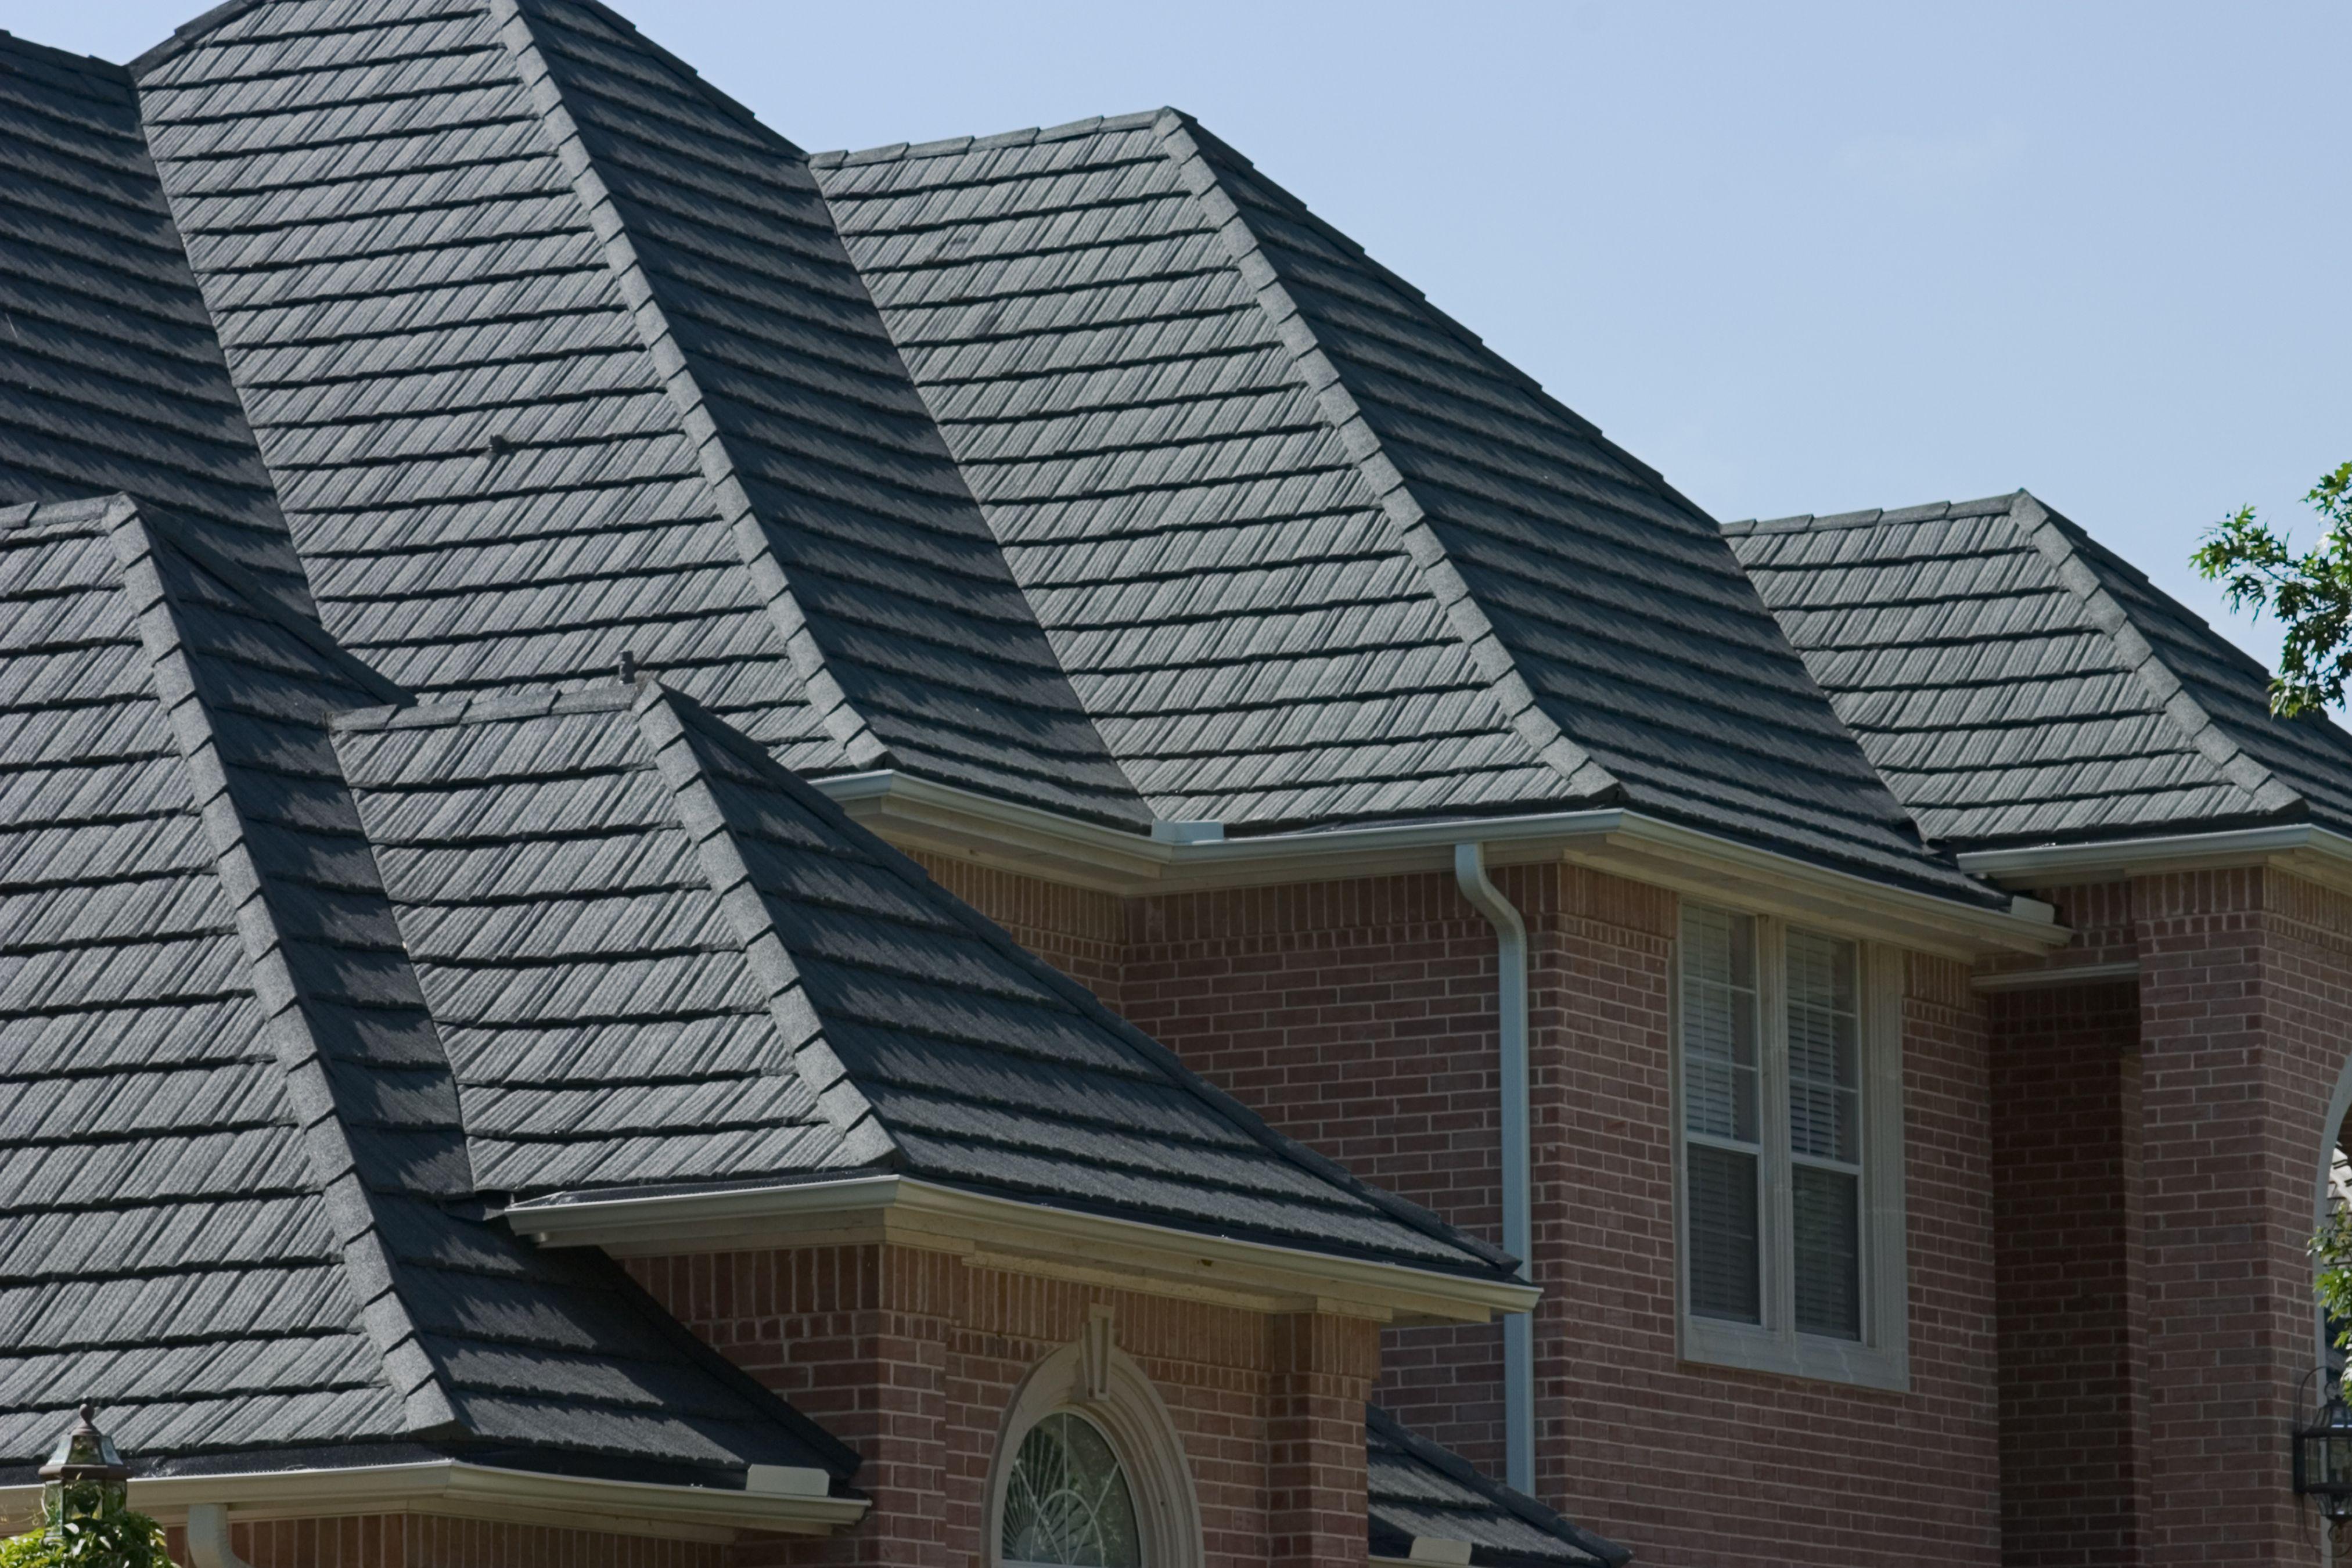 Gerard Stone Coated Steel Metal Roofing Timberwood Canyon Shake Metal Shingles Zinc Roof Metal Roof